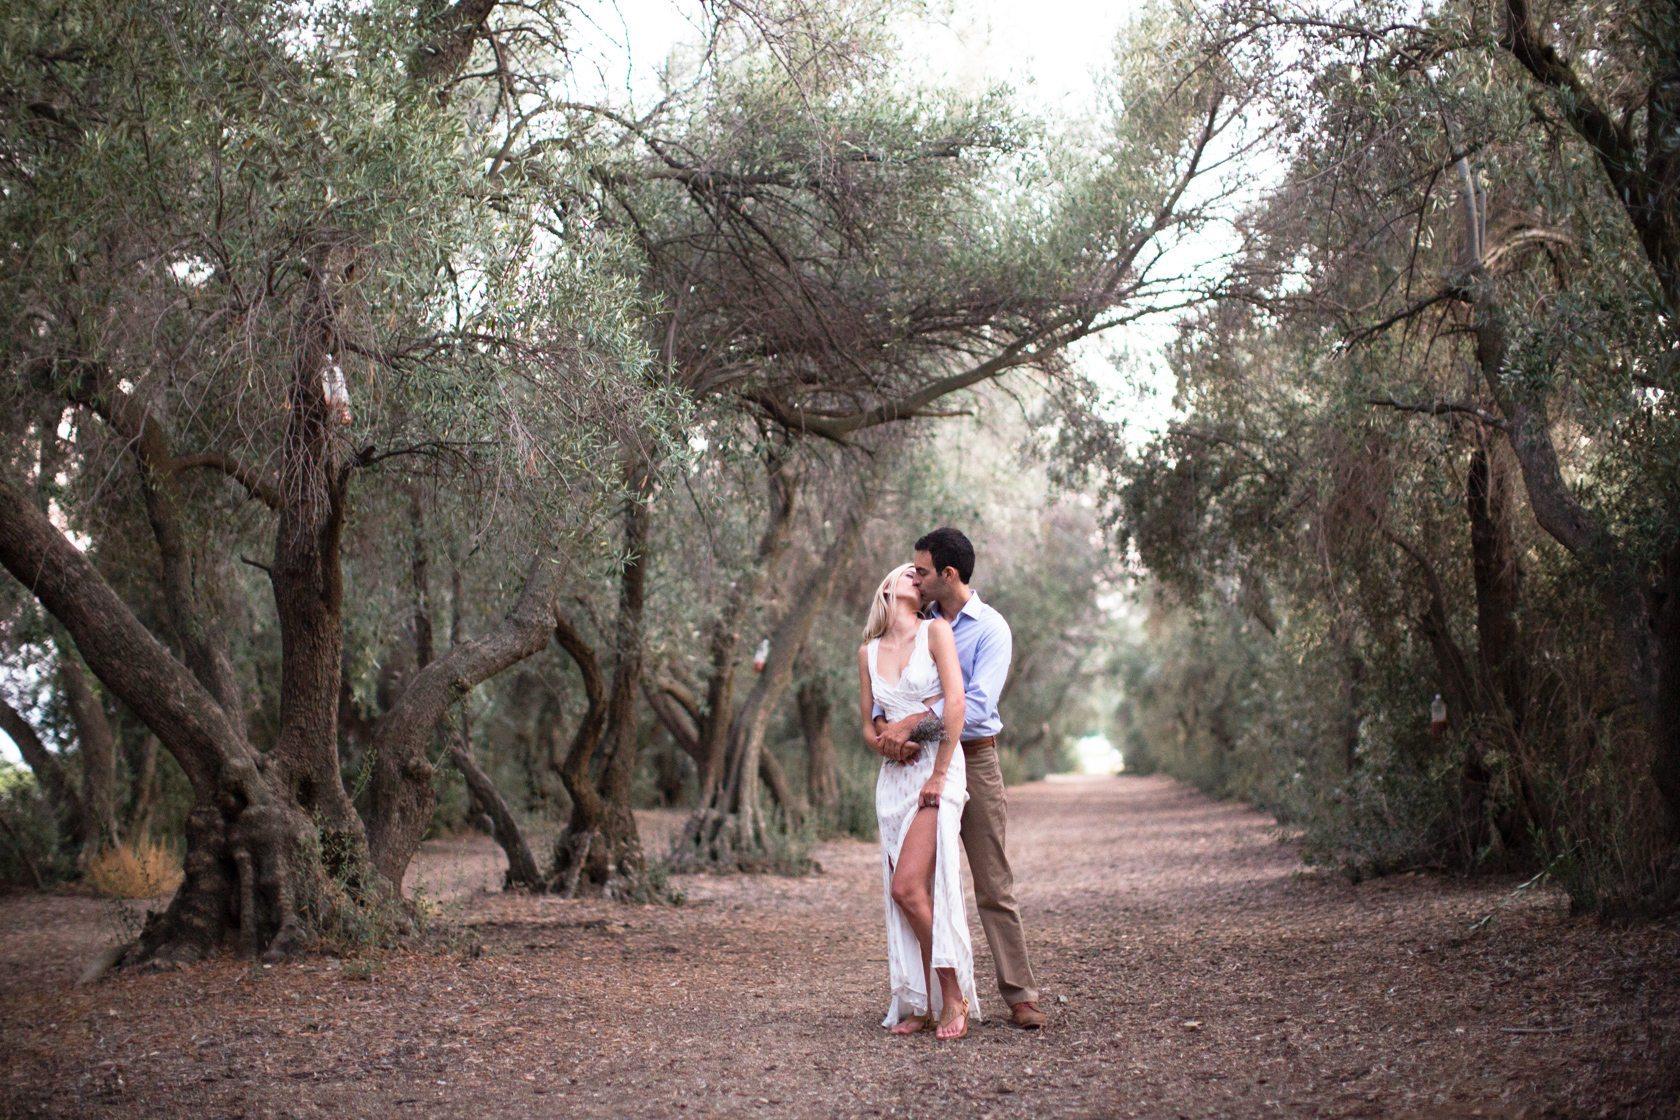 Highland_Springs_Lavender_Field_Engagement_06.jpg